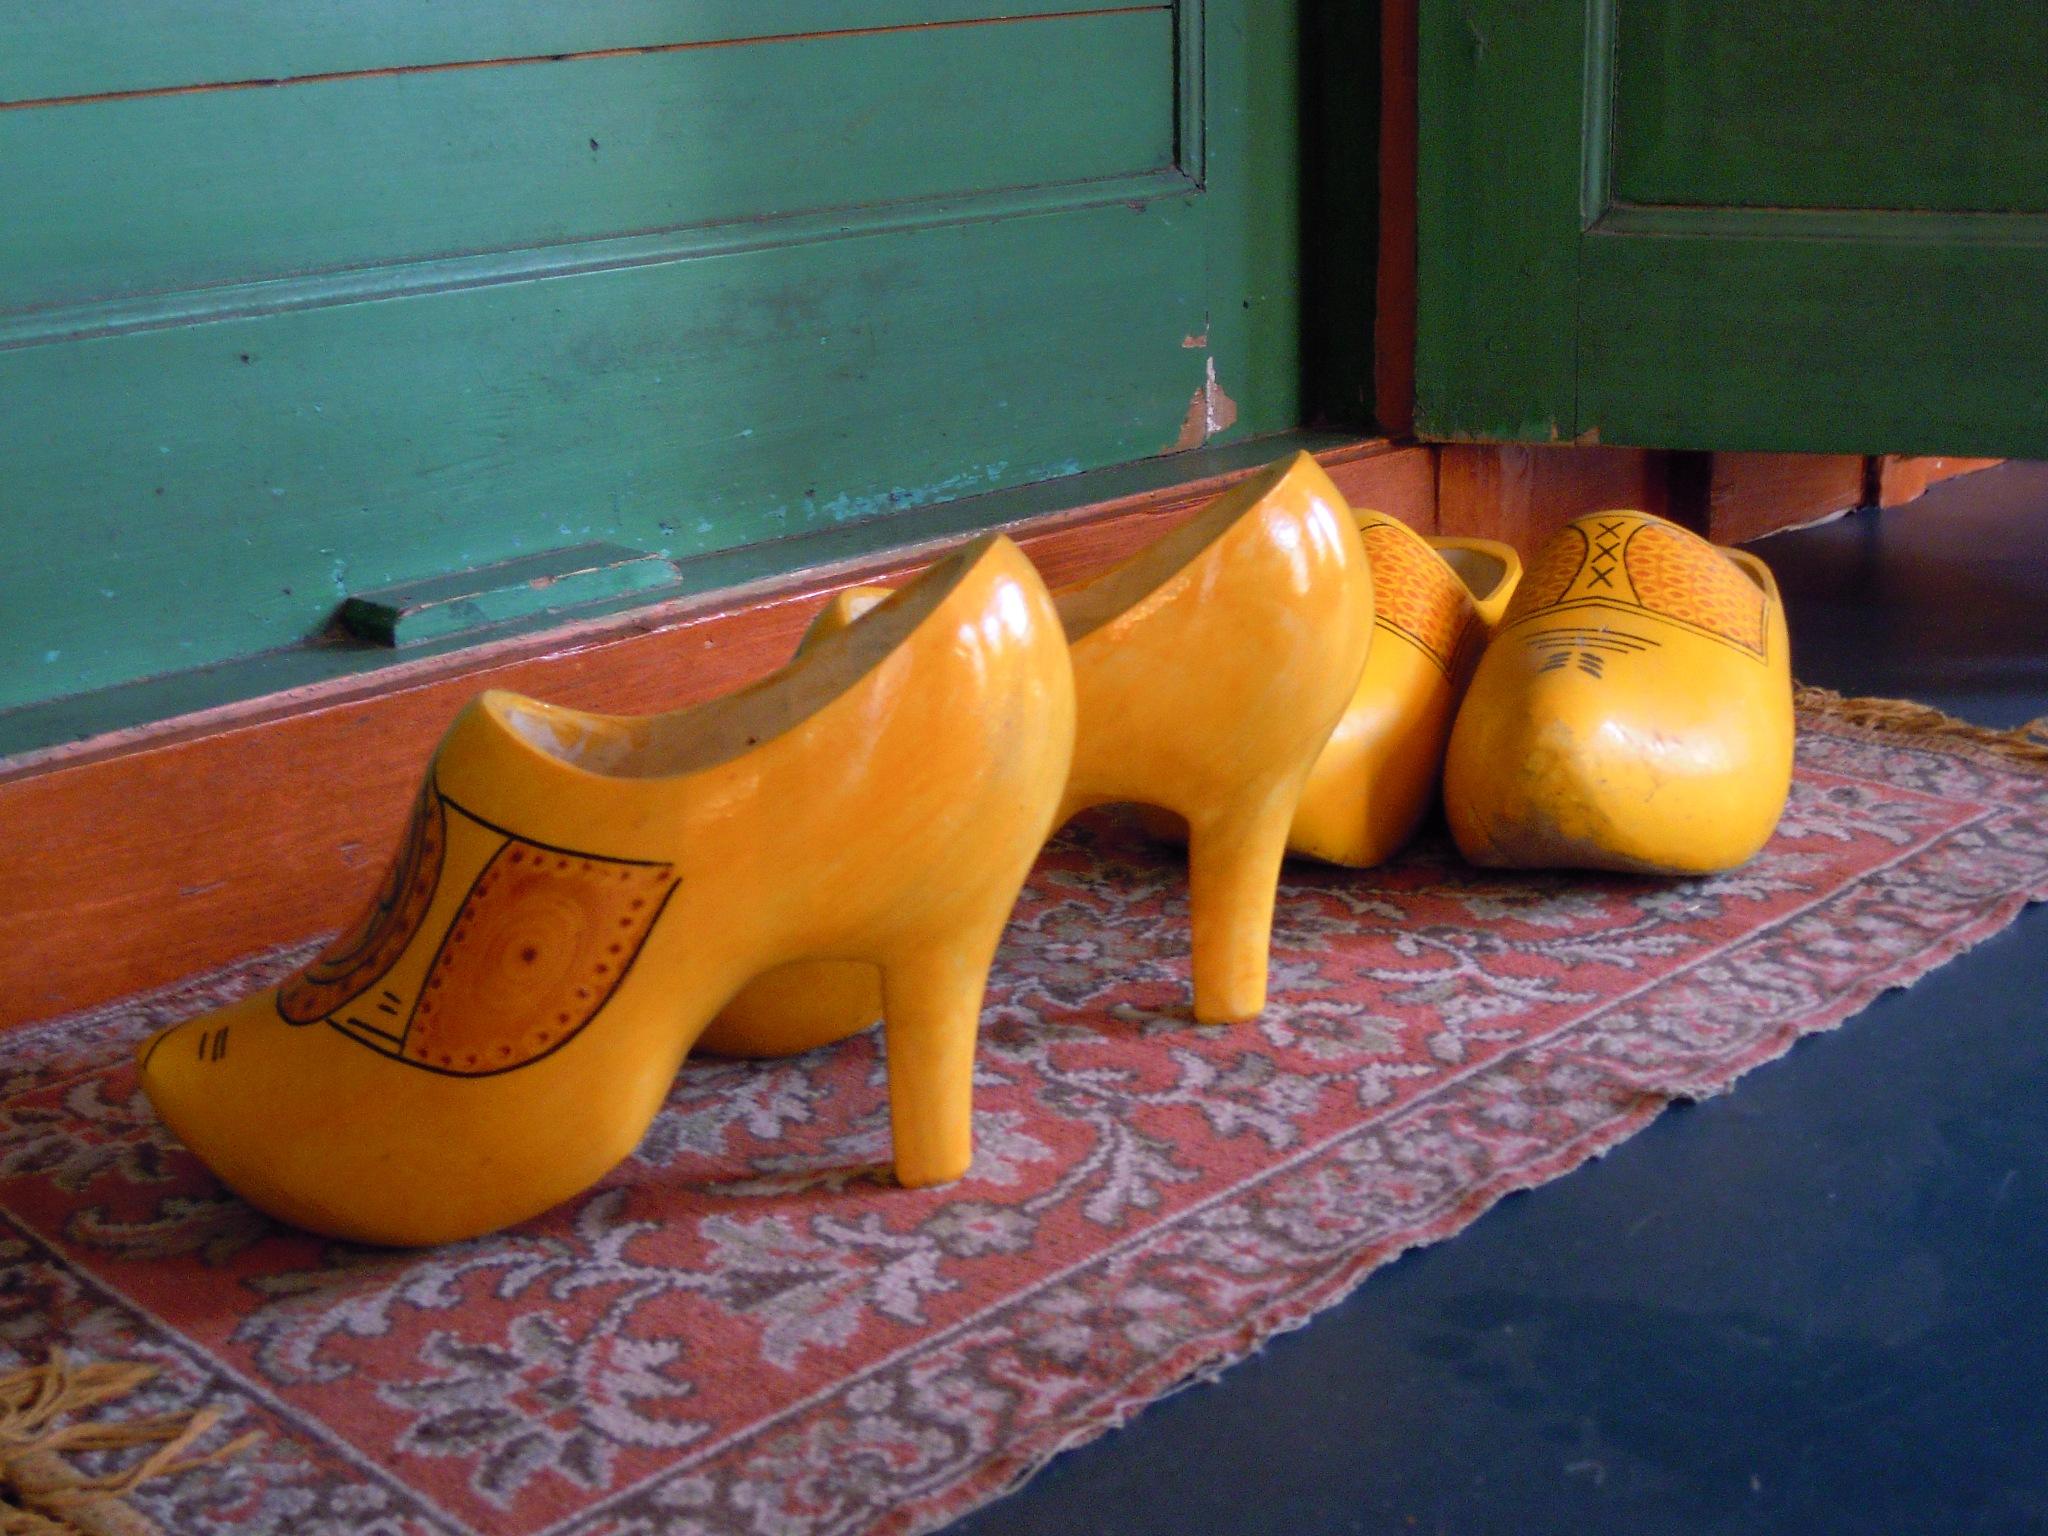 Curious high-heeled Dutch clogs by Bice Portinari